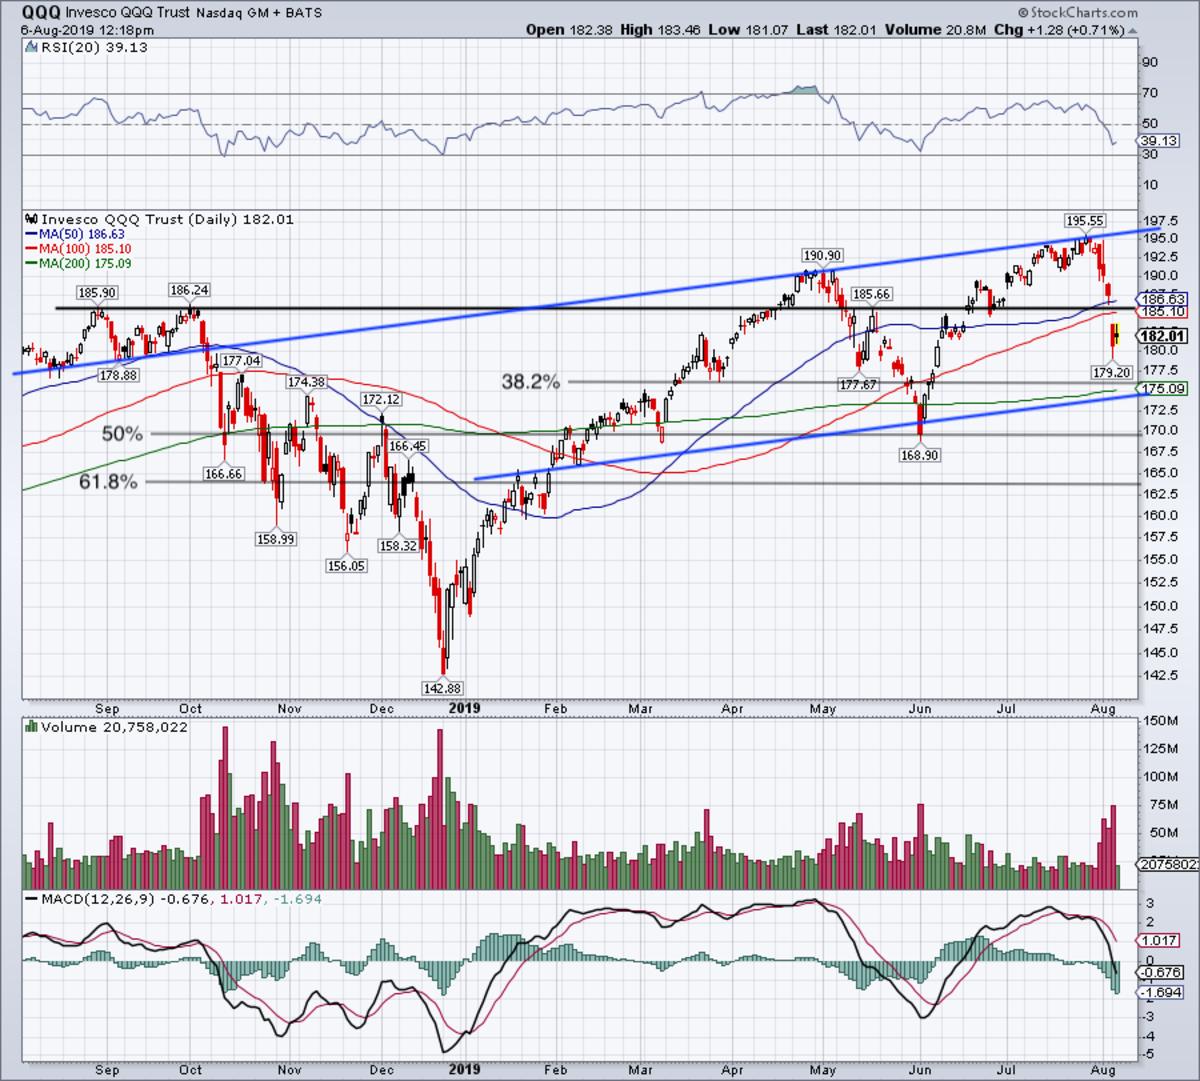 Daily chart of QQQ stock.